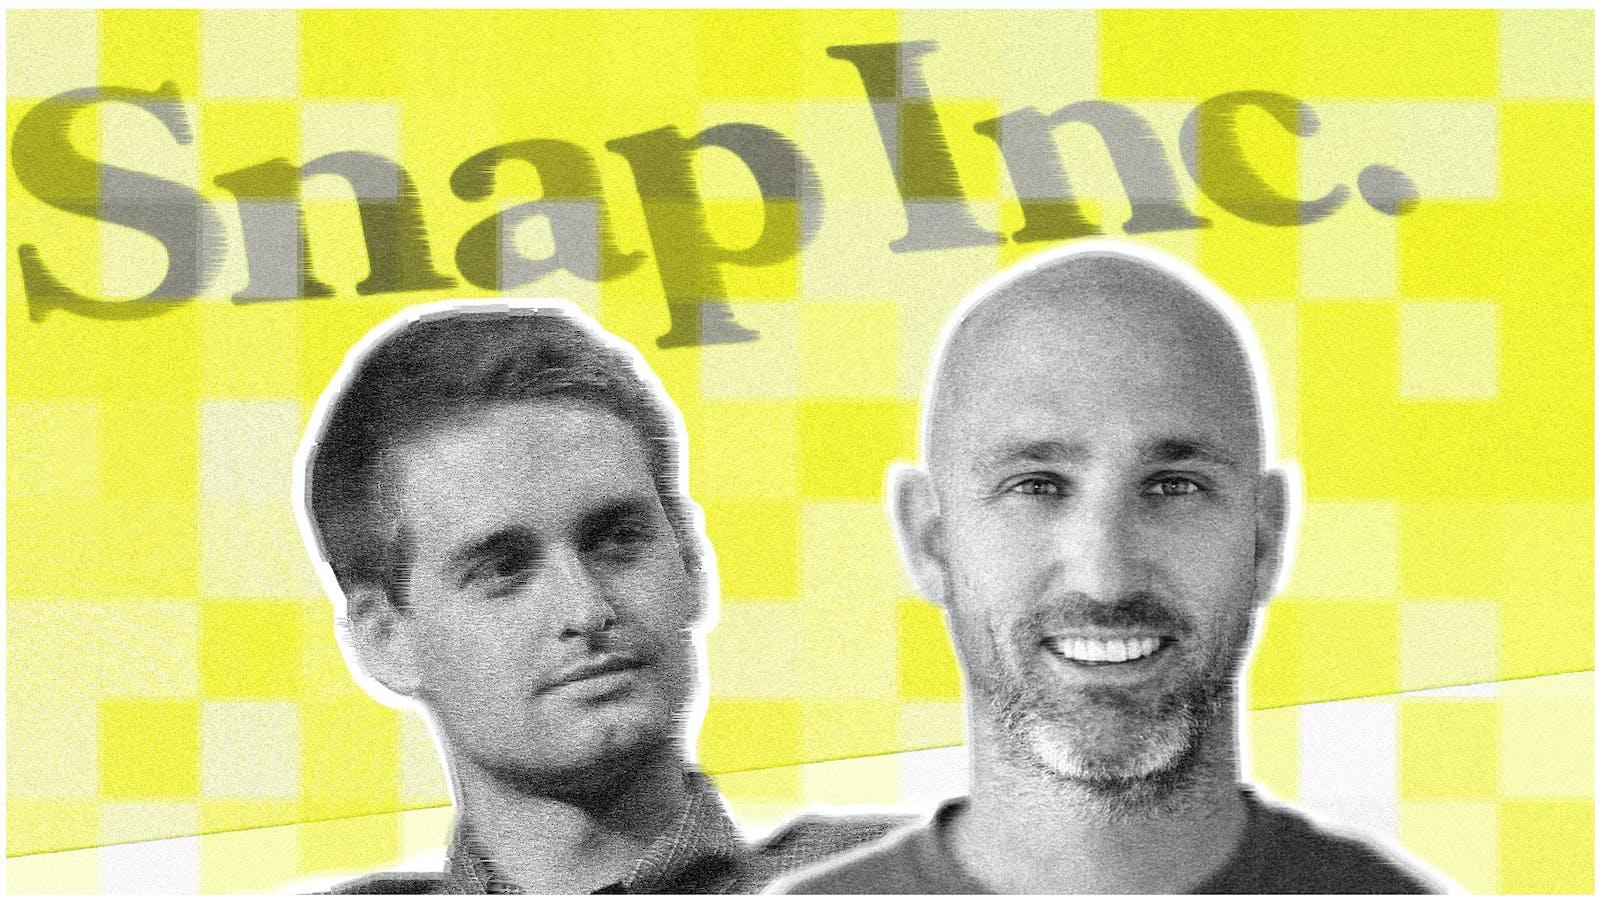 Snap CEO Evan Spiegel and People VP Jason Halbert. Art by Mike Sullivan